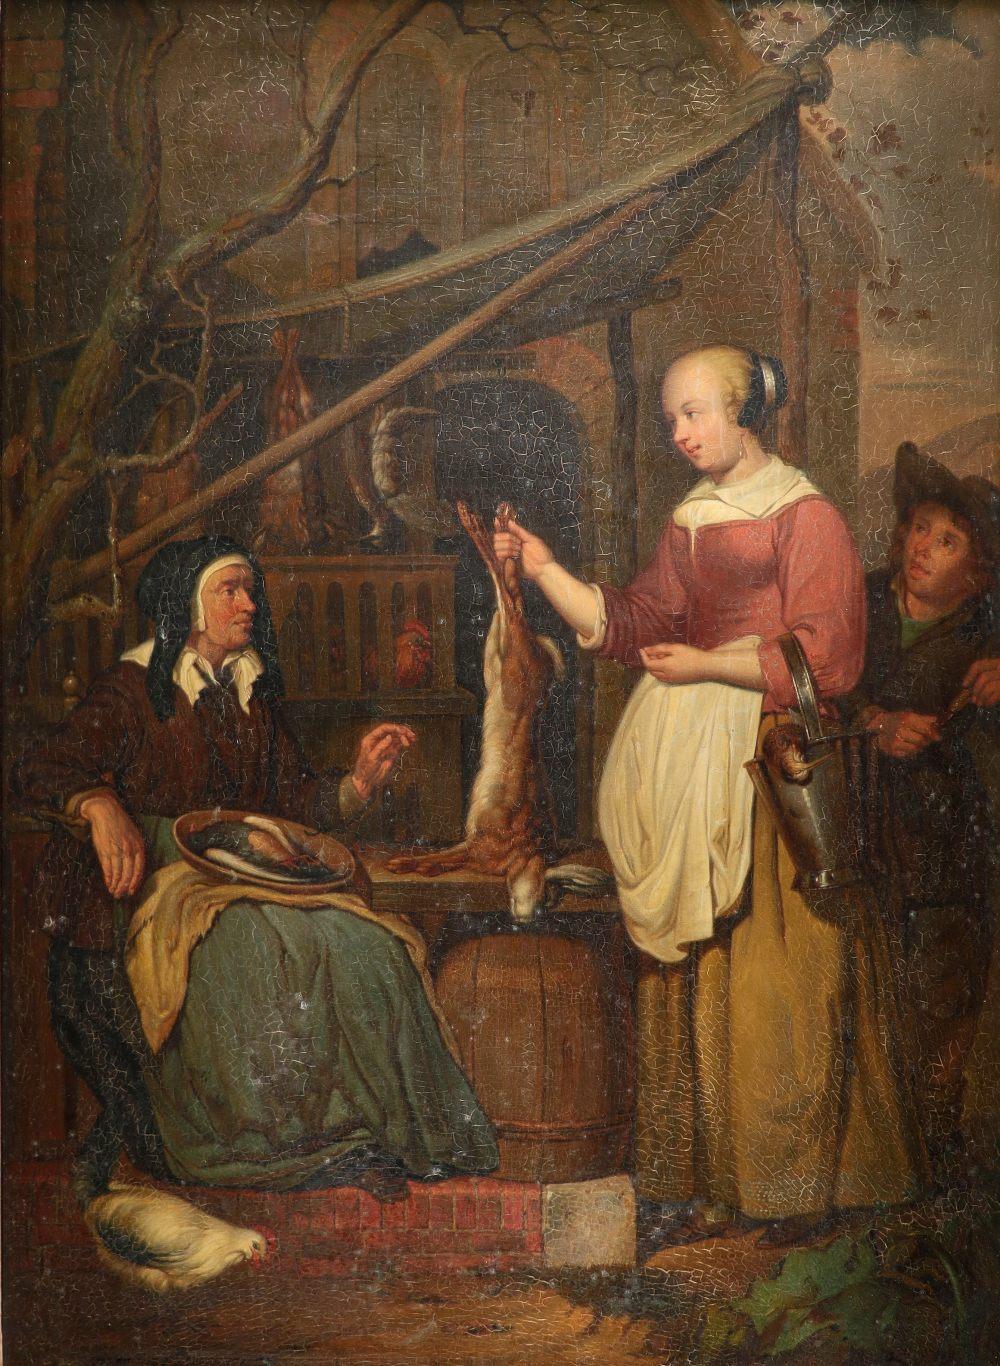 P. J. Neuman (Belgian 19th Century) after Gabriλl Metsu (Dutch 1629-1667) The old game dealer